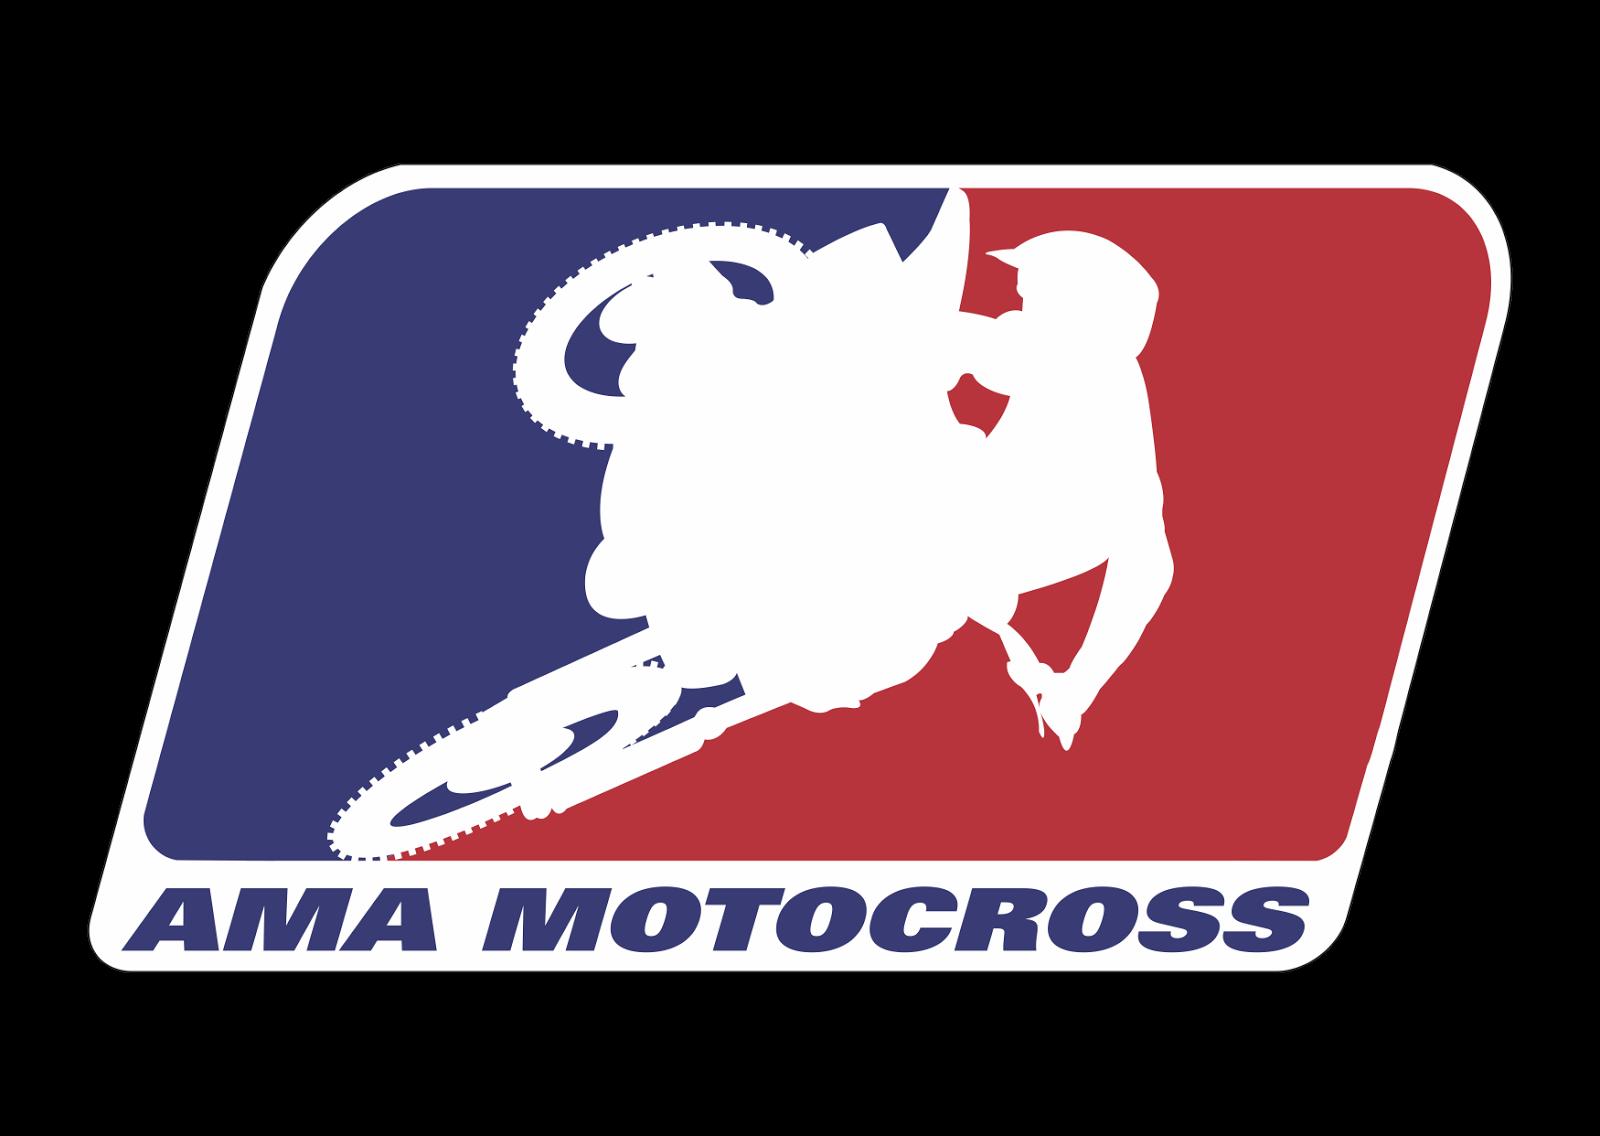 AMA Motocross Logo Wallpaper